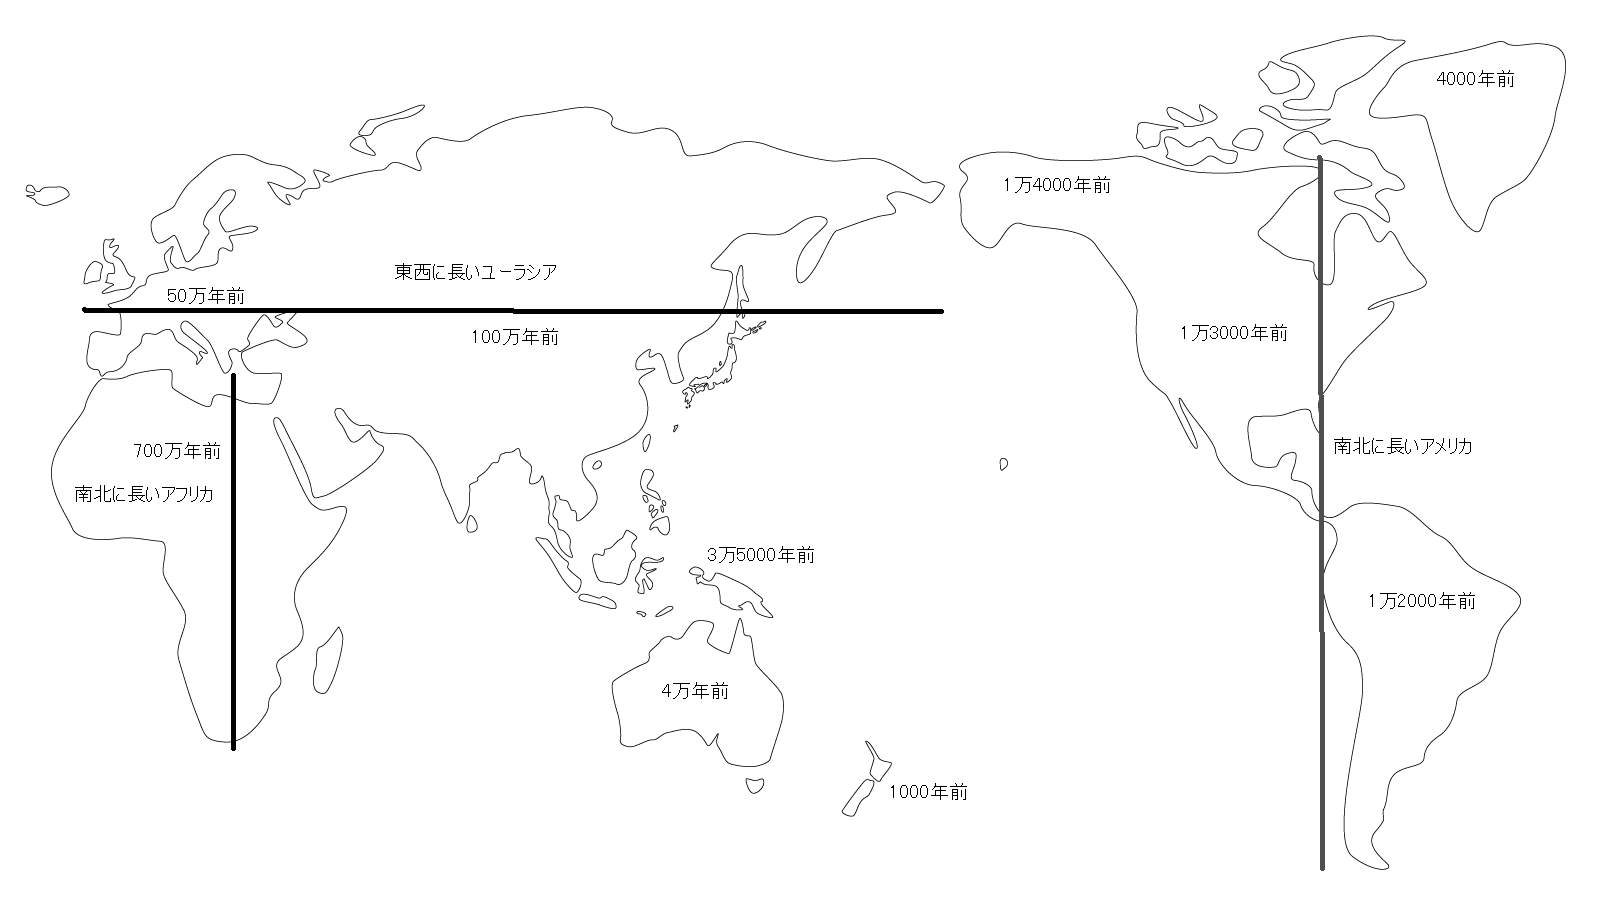 NAVER まとめ世界地図 白地図集